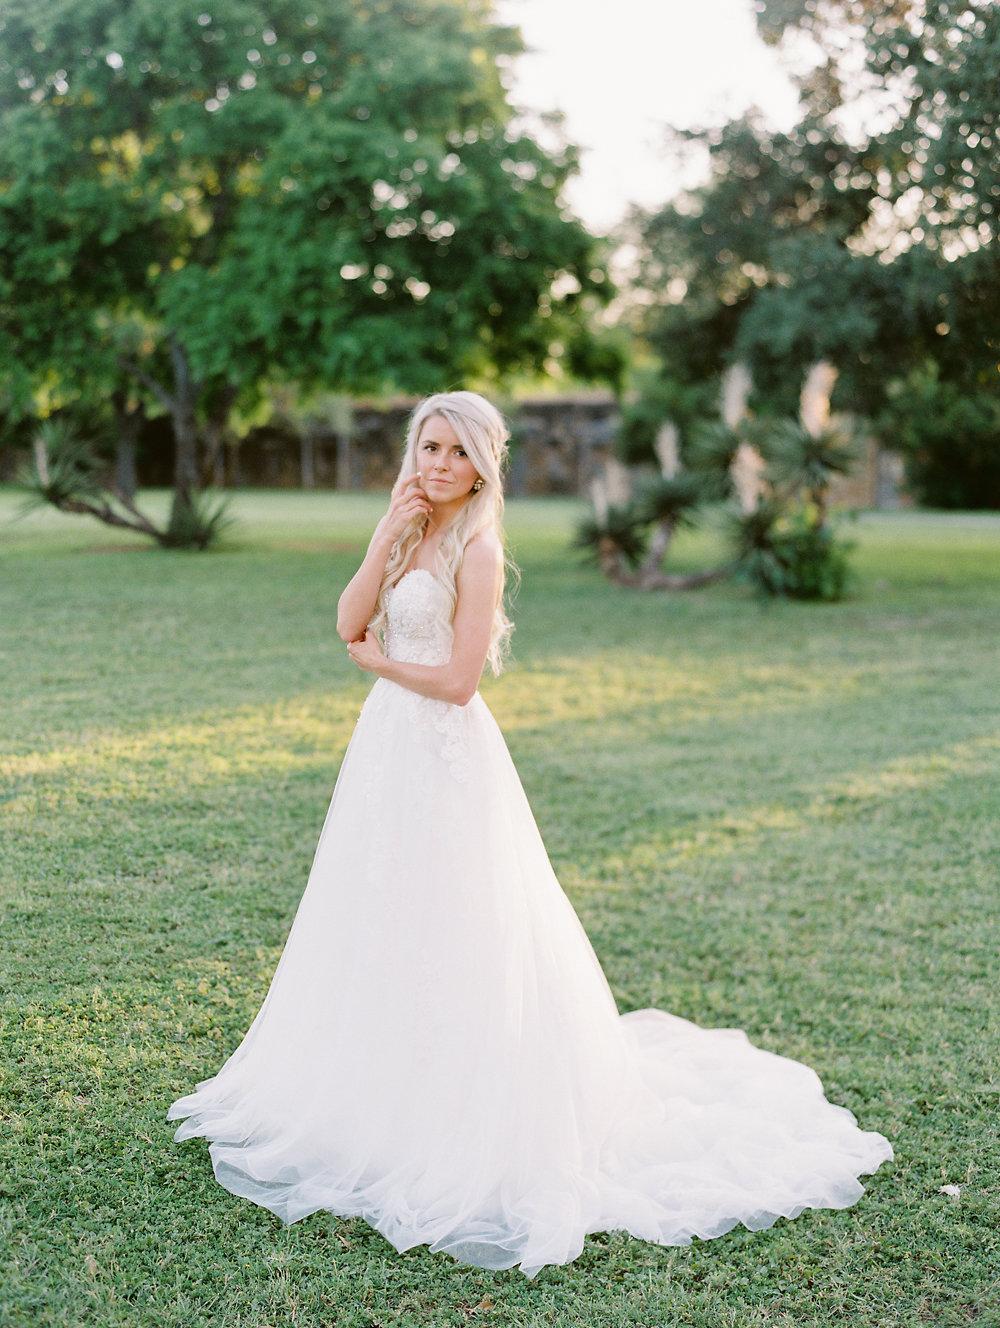 Best-Austin-Denver-California-Wedding-Photographers-fine-art-film-Bridal-session-Mission-San-Jose-San-Antonio-3.jpg